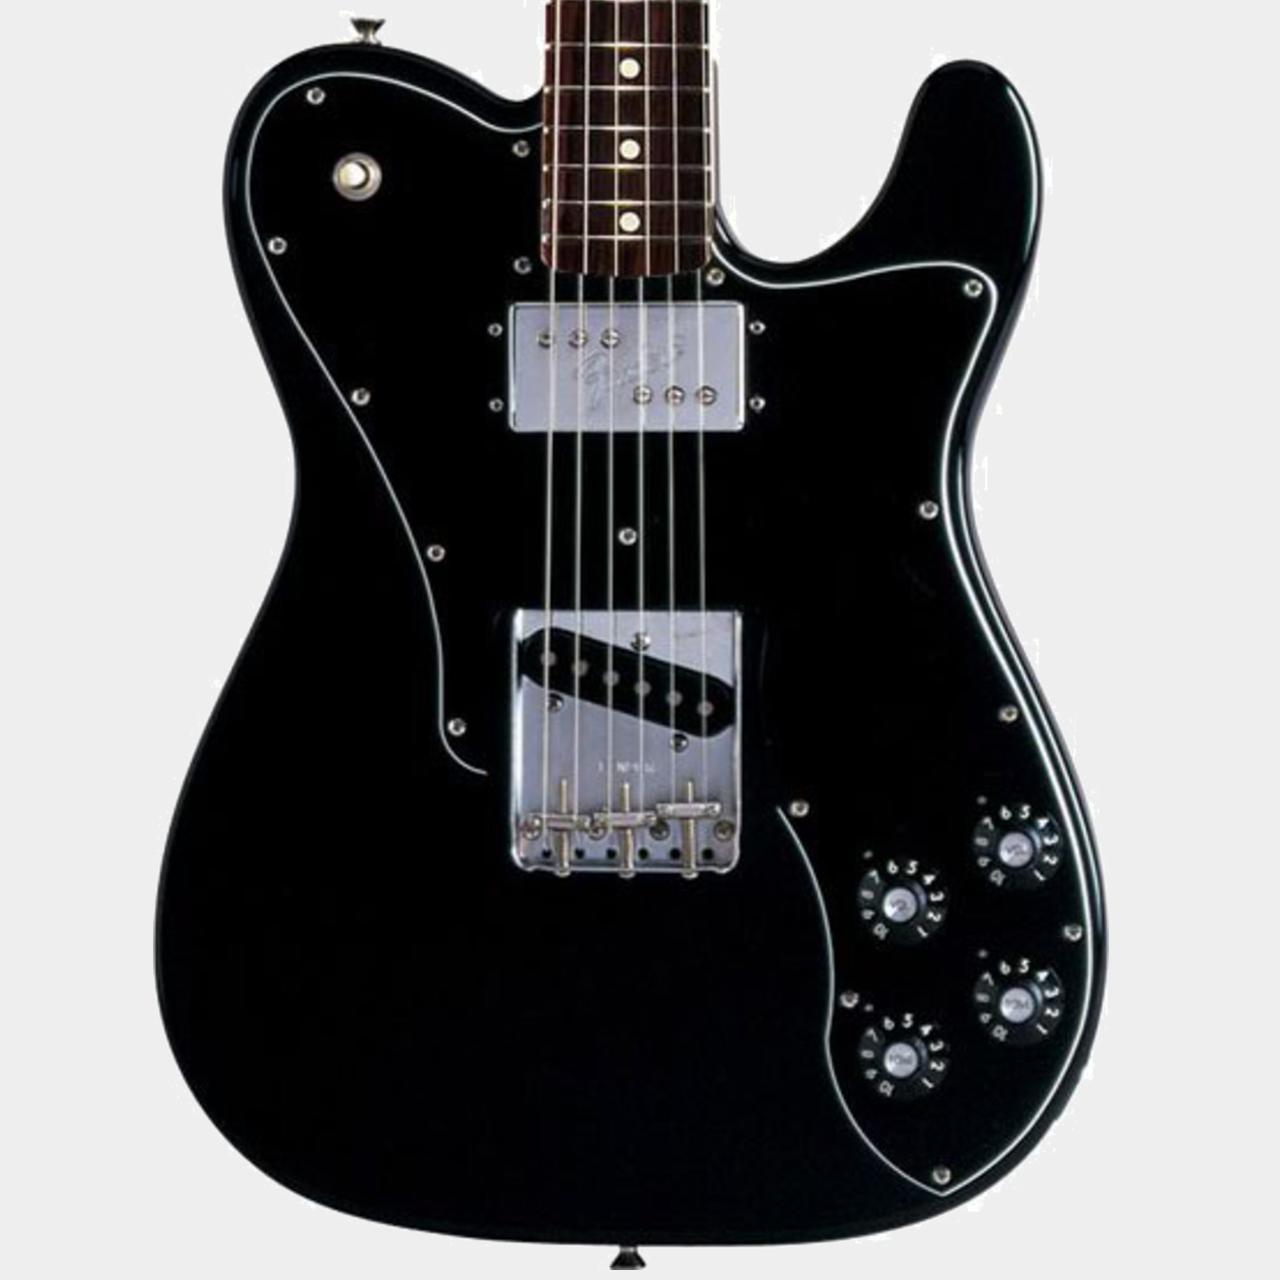 Fender Squier klassischer modifizierte Telecaster Custom